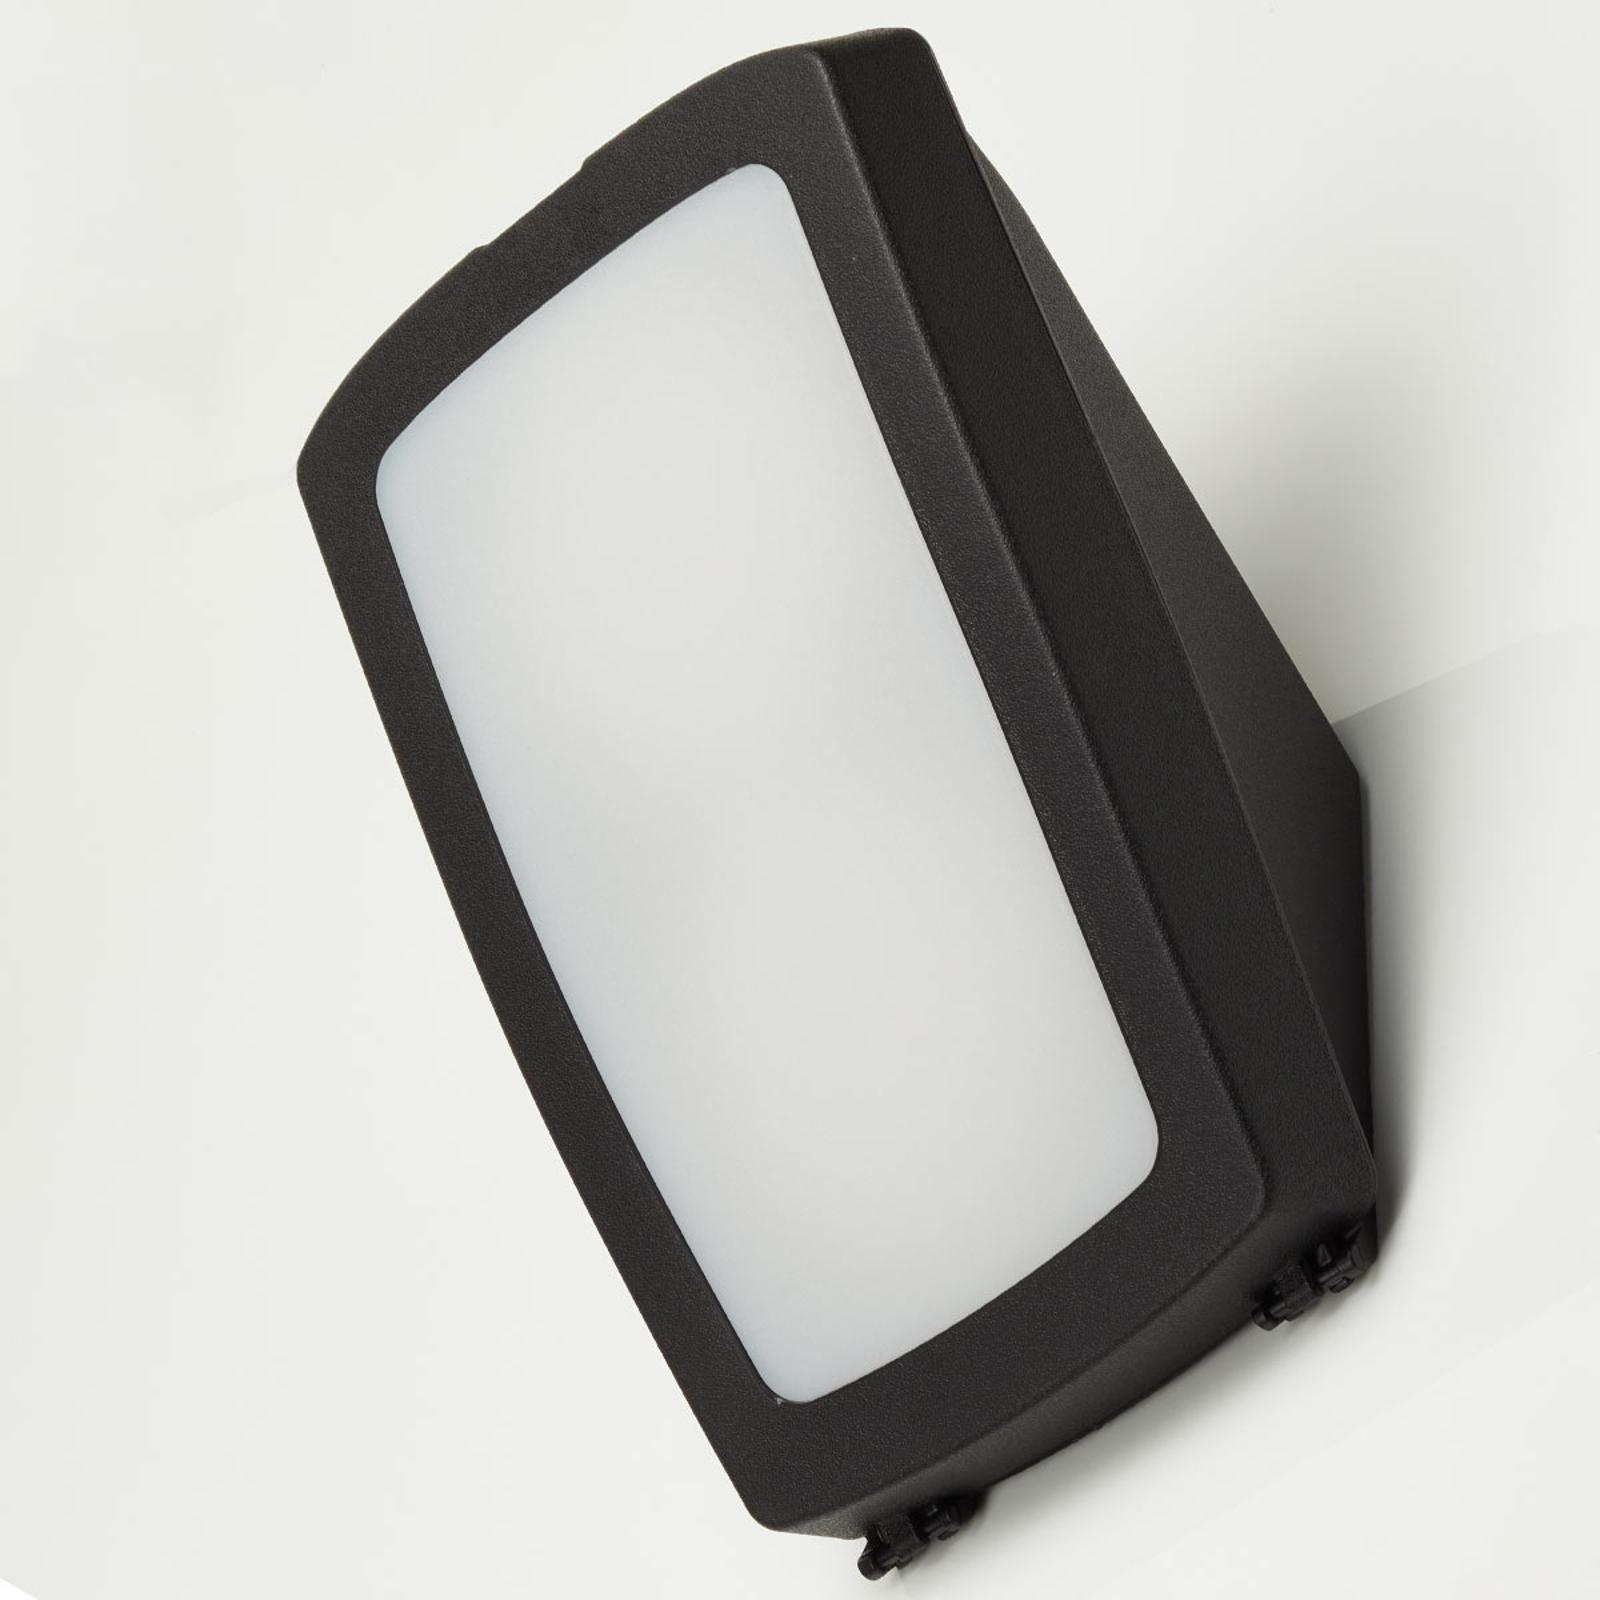 LED buitenwandlamp Germana, zwart, 2 x 7W CCT